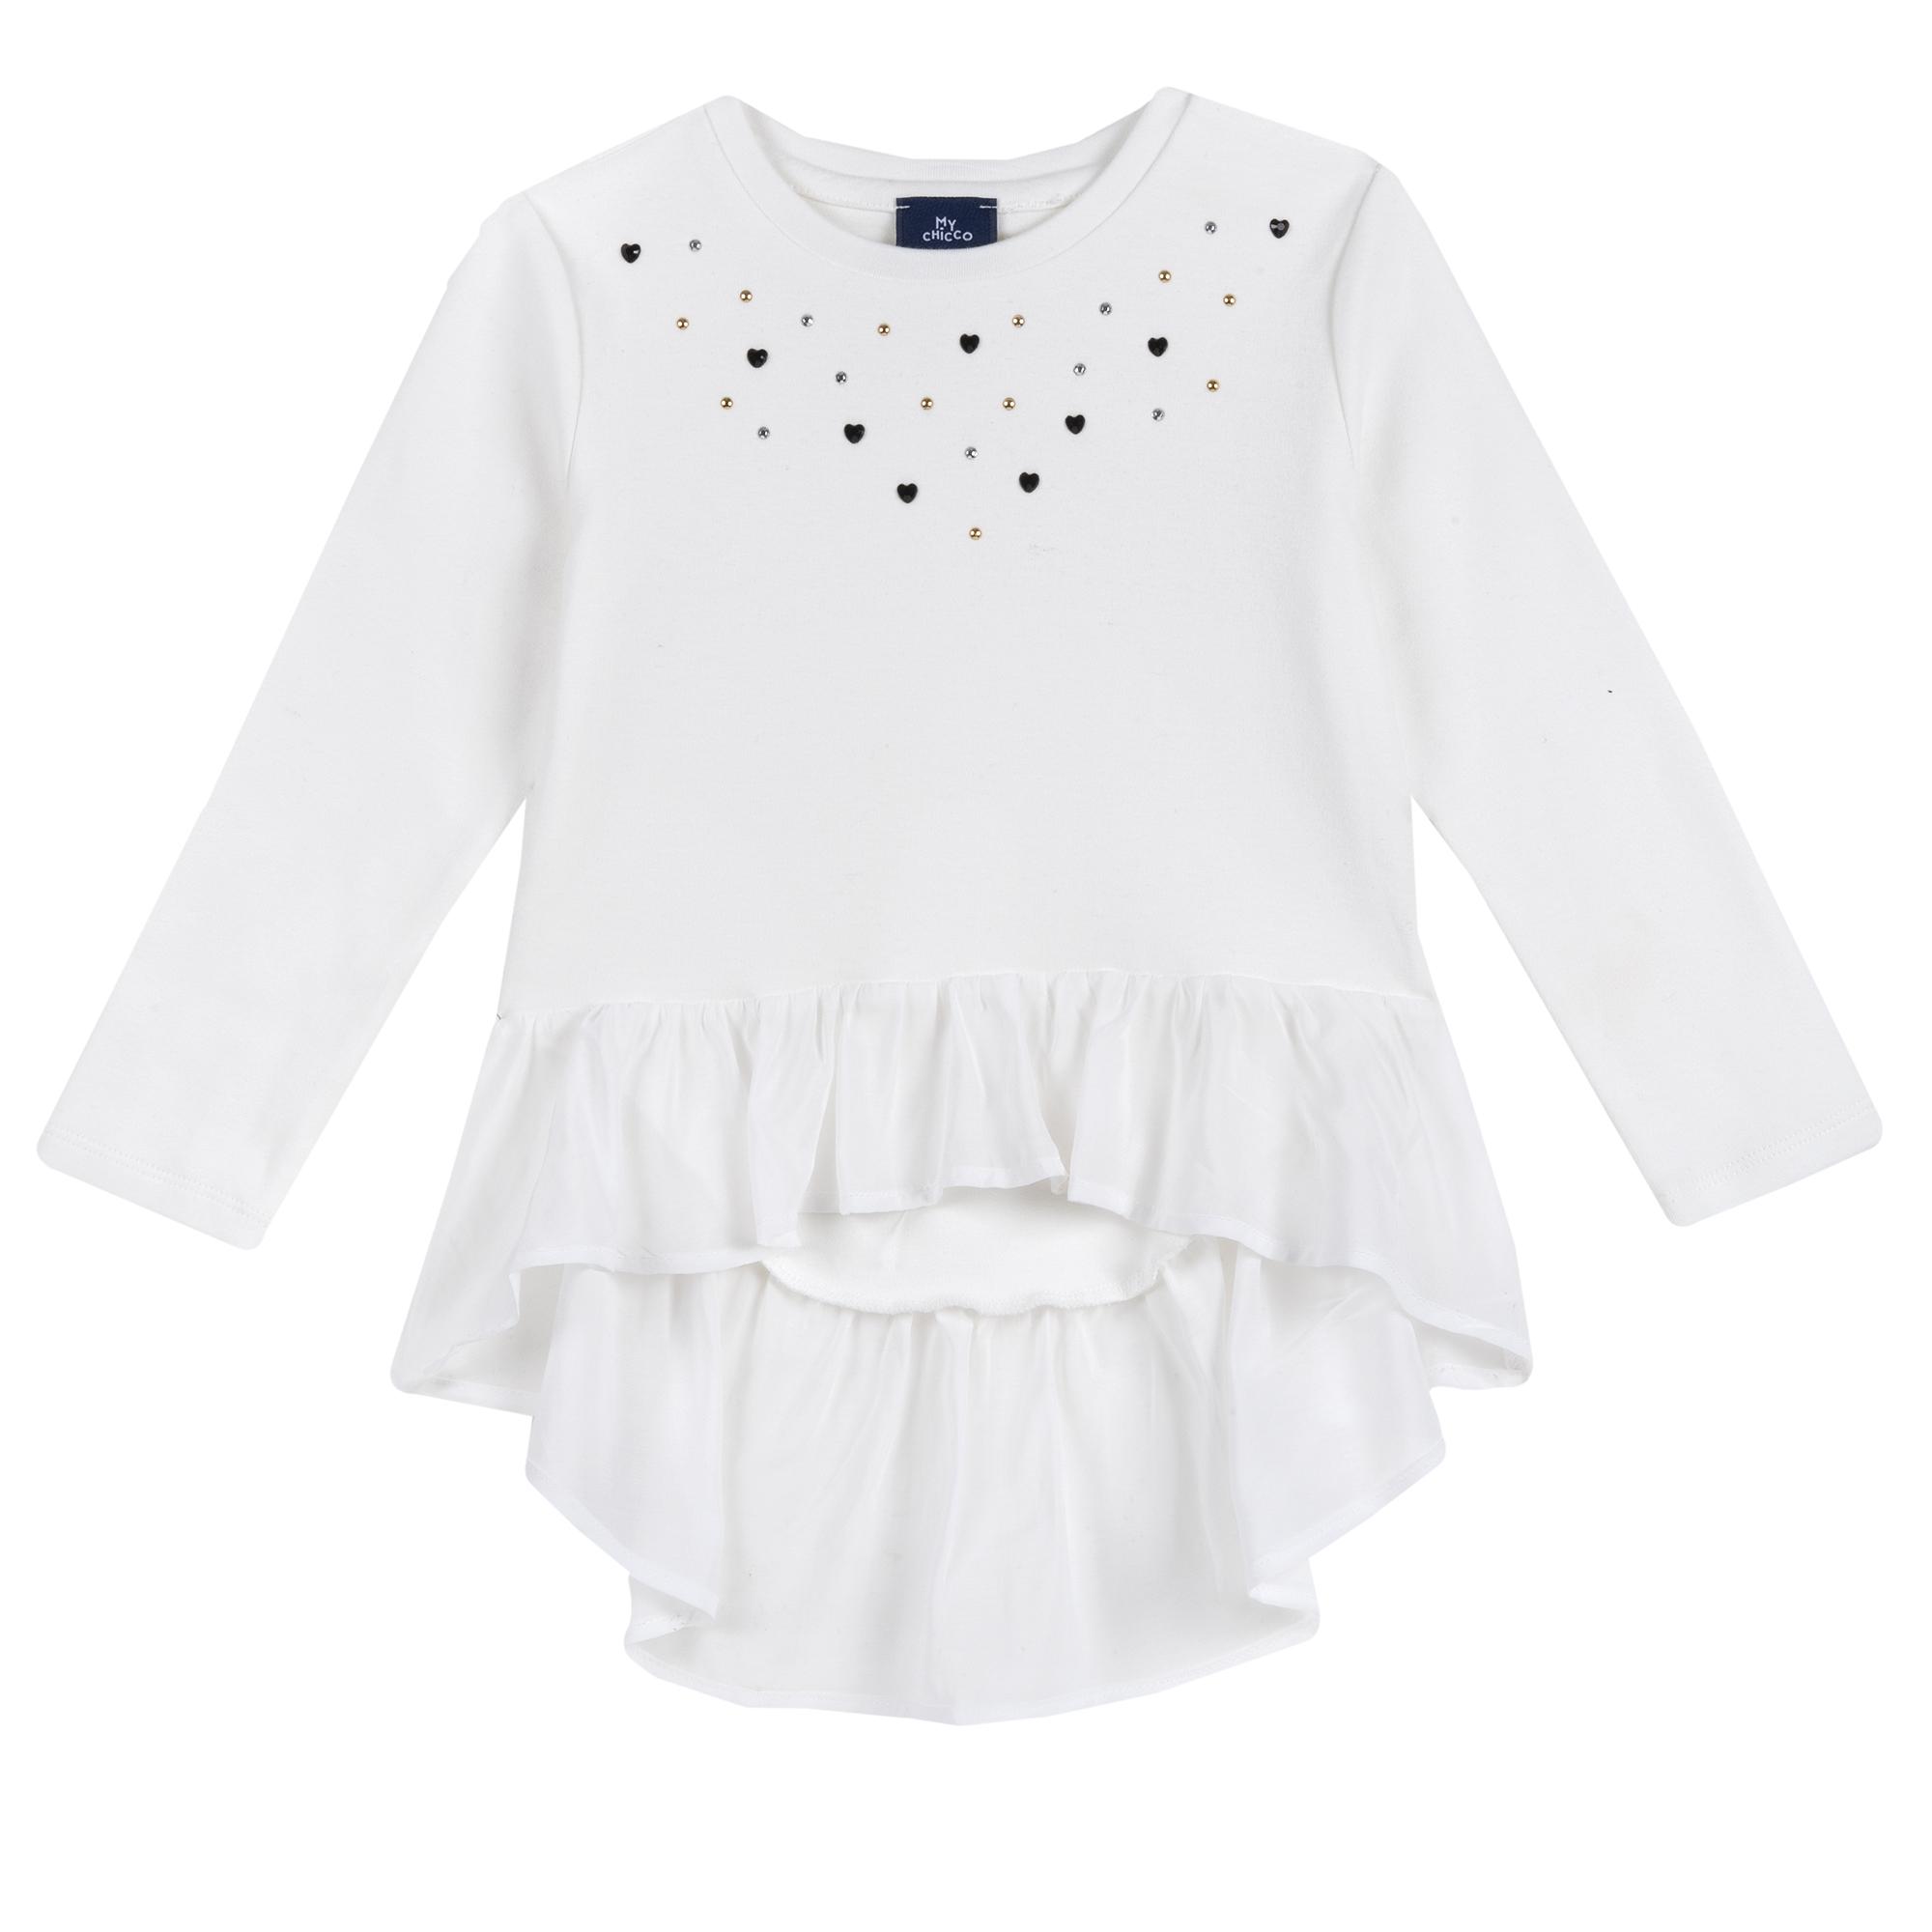 Bluza Copii Chicco, Volanas, Alb, 47907 imagine